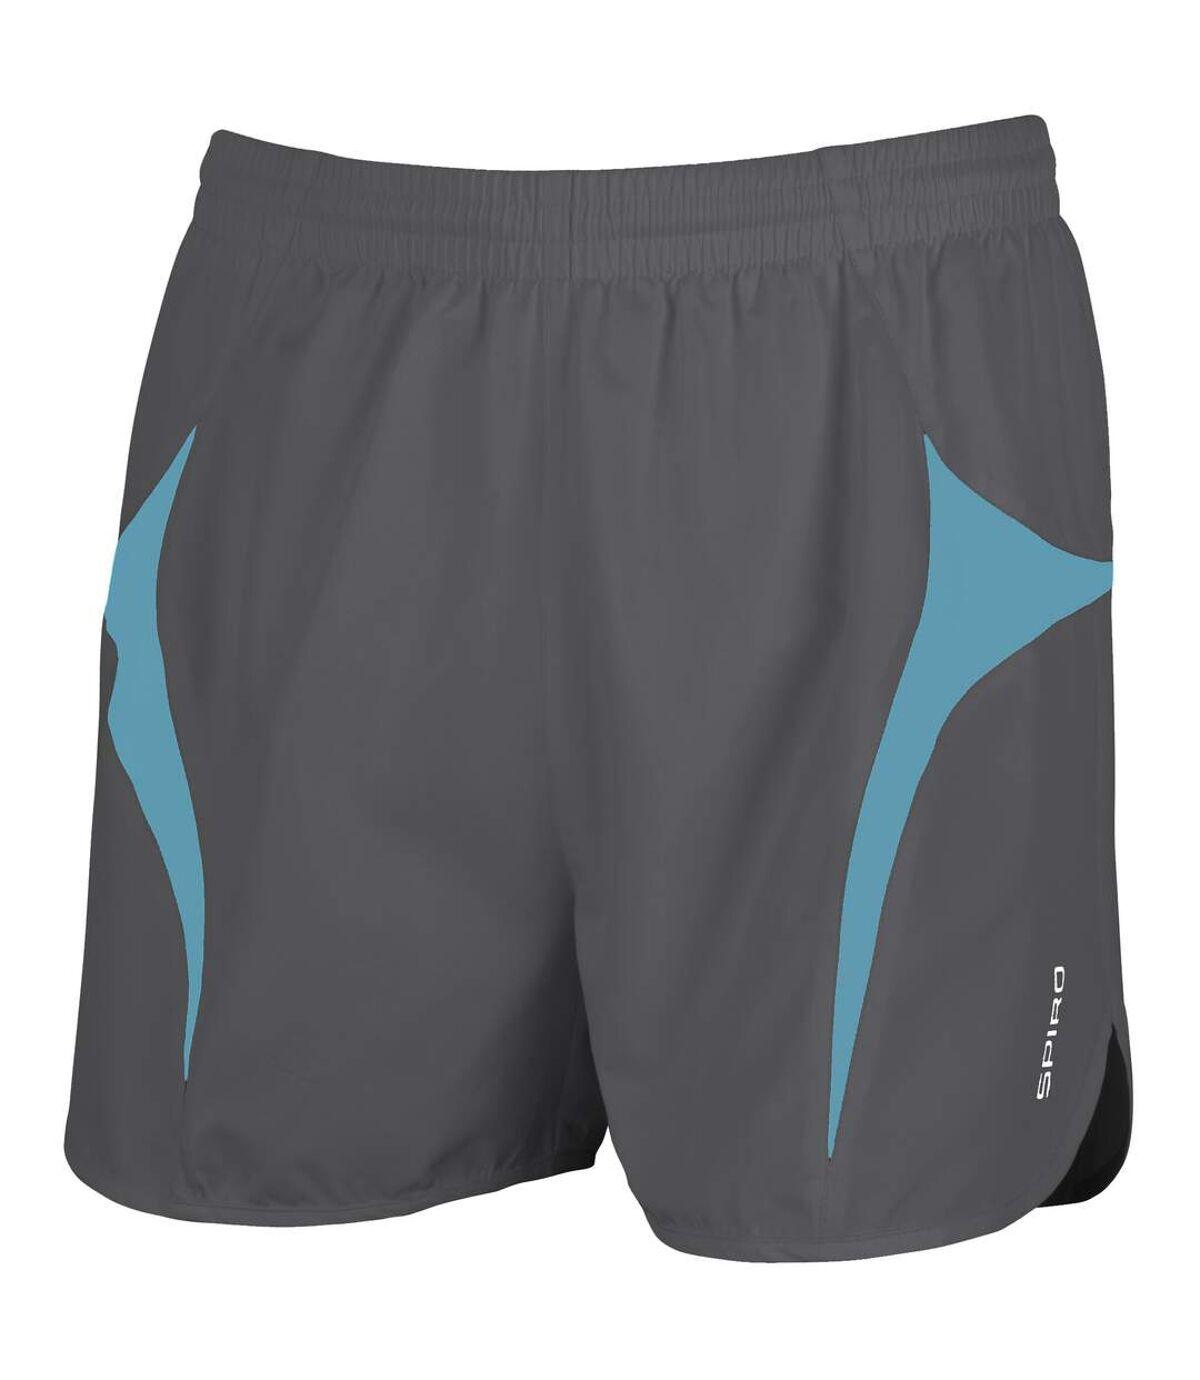 Spiro Mens Sports Micro-Lite Running Shorts (Grey/Aqua) - UTRW1477